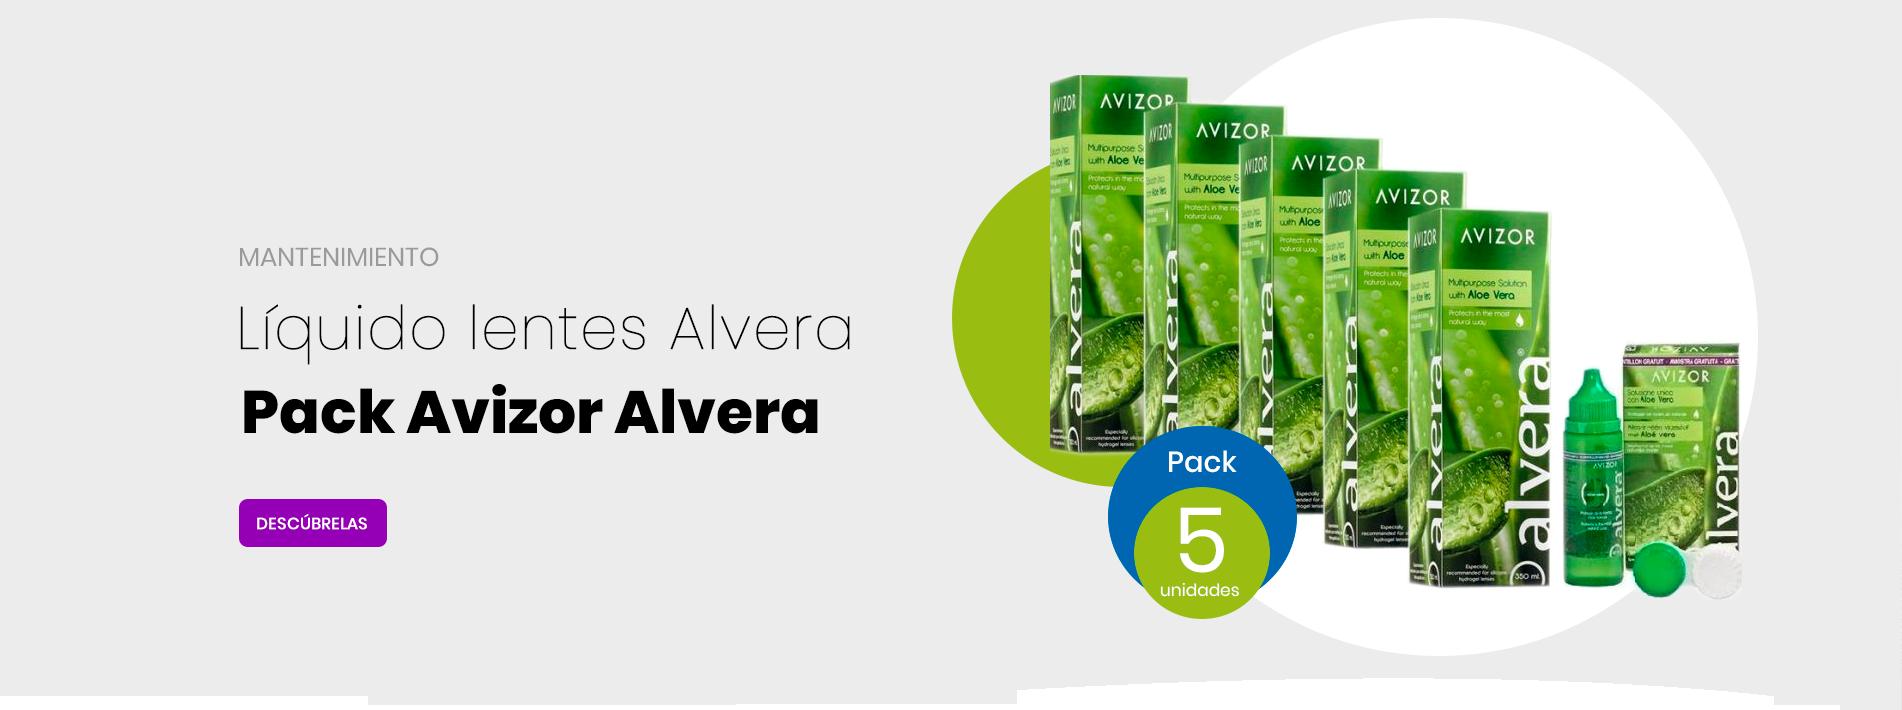 Pack Avizor Alvera 5 Uds 350 Ml + Solución 60ml